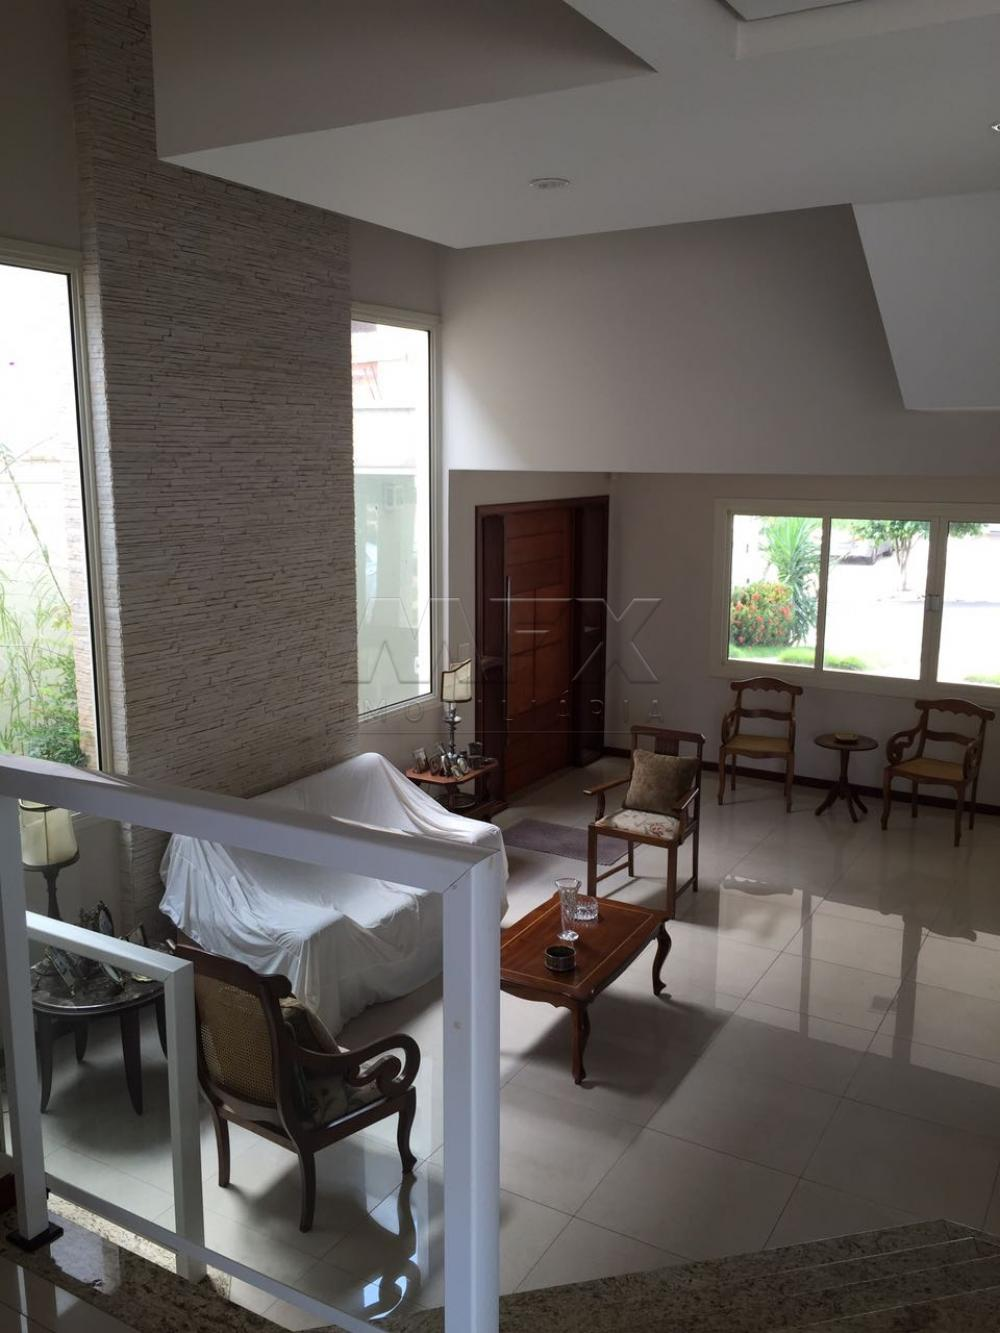 Alugar Casa / Condomínio em Bauru R$ 7.000,00 - Foto 1